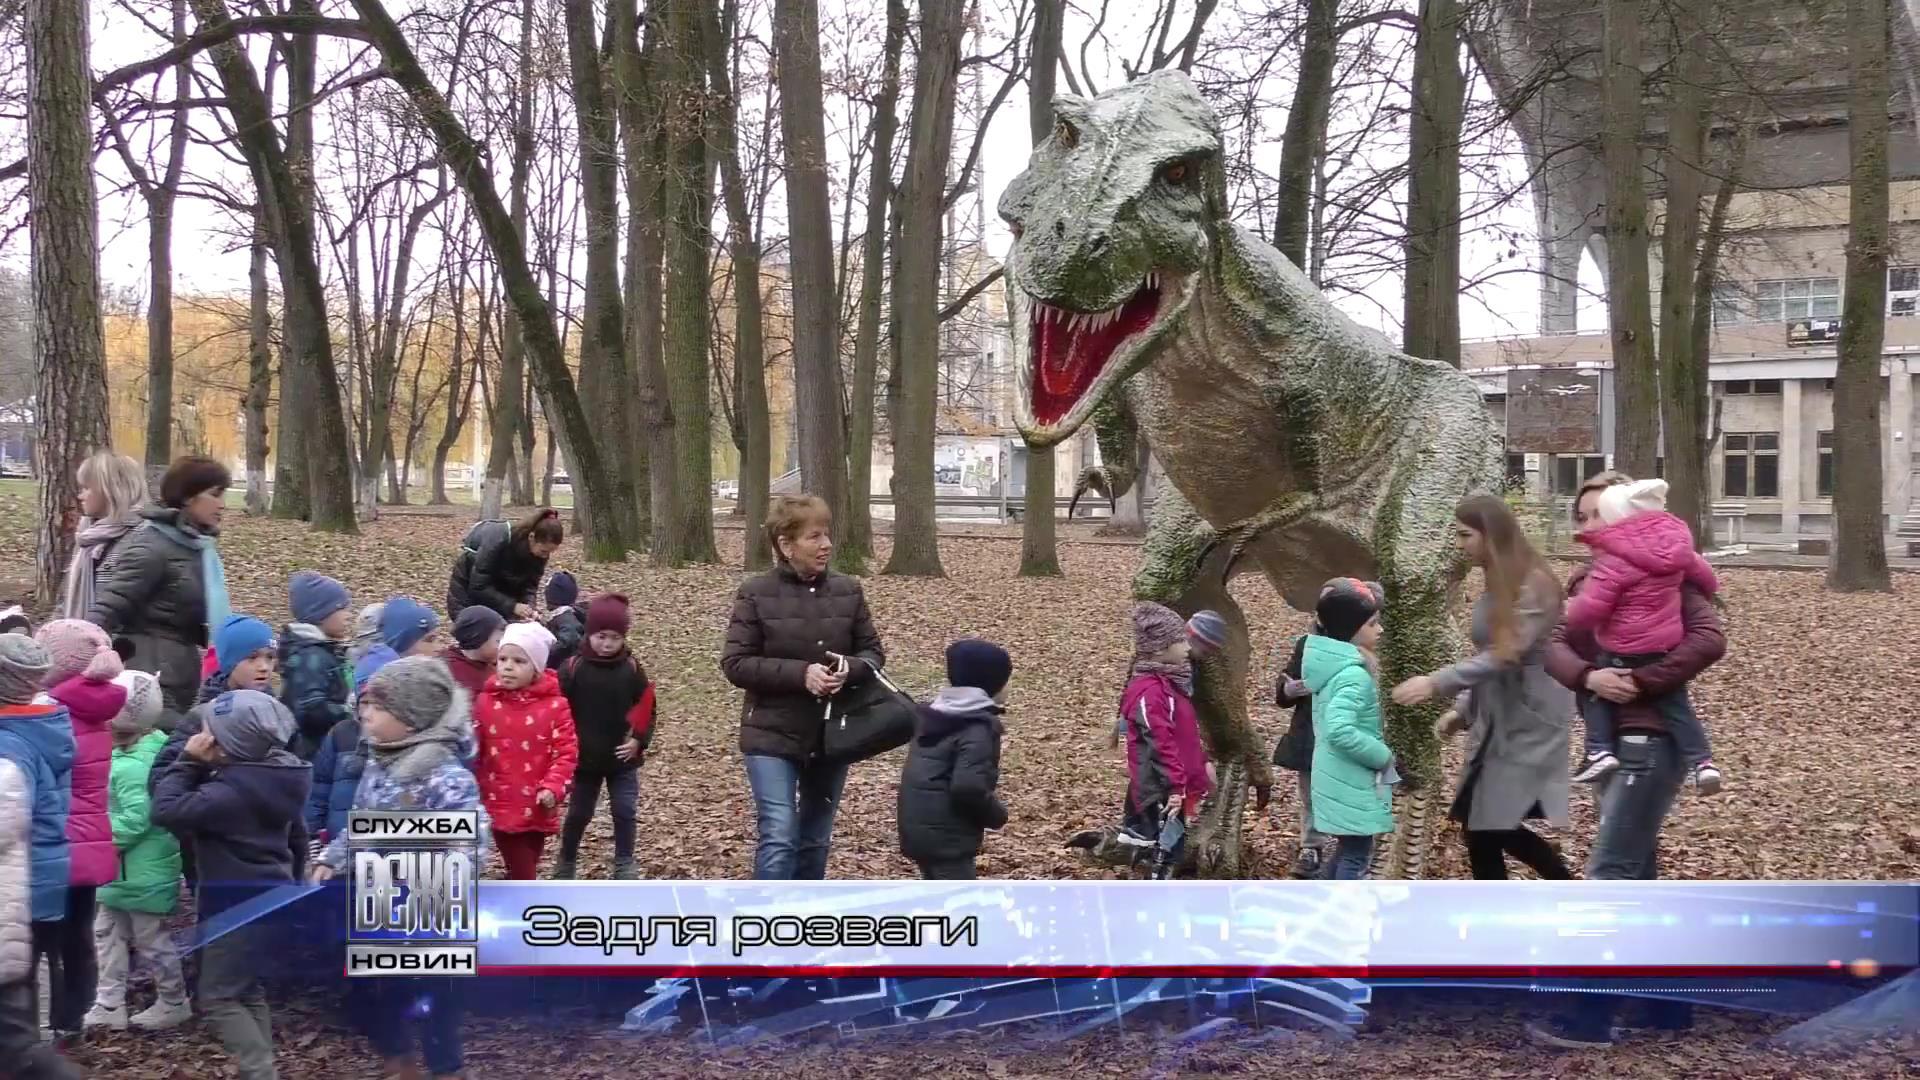 У парку Шевченка поселився динозавр[18-53-16]